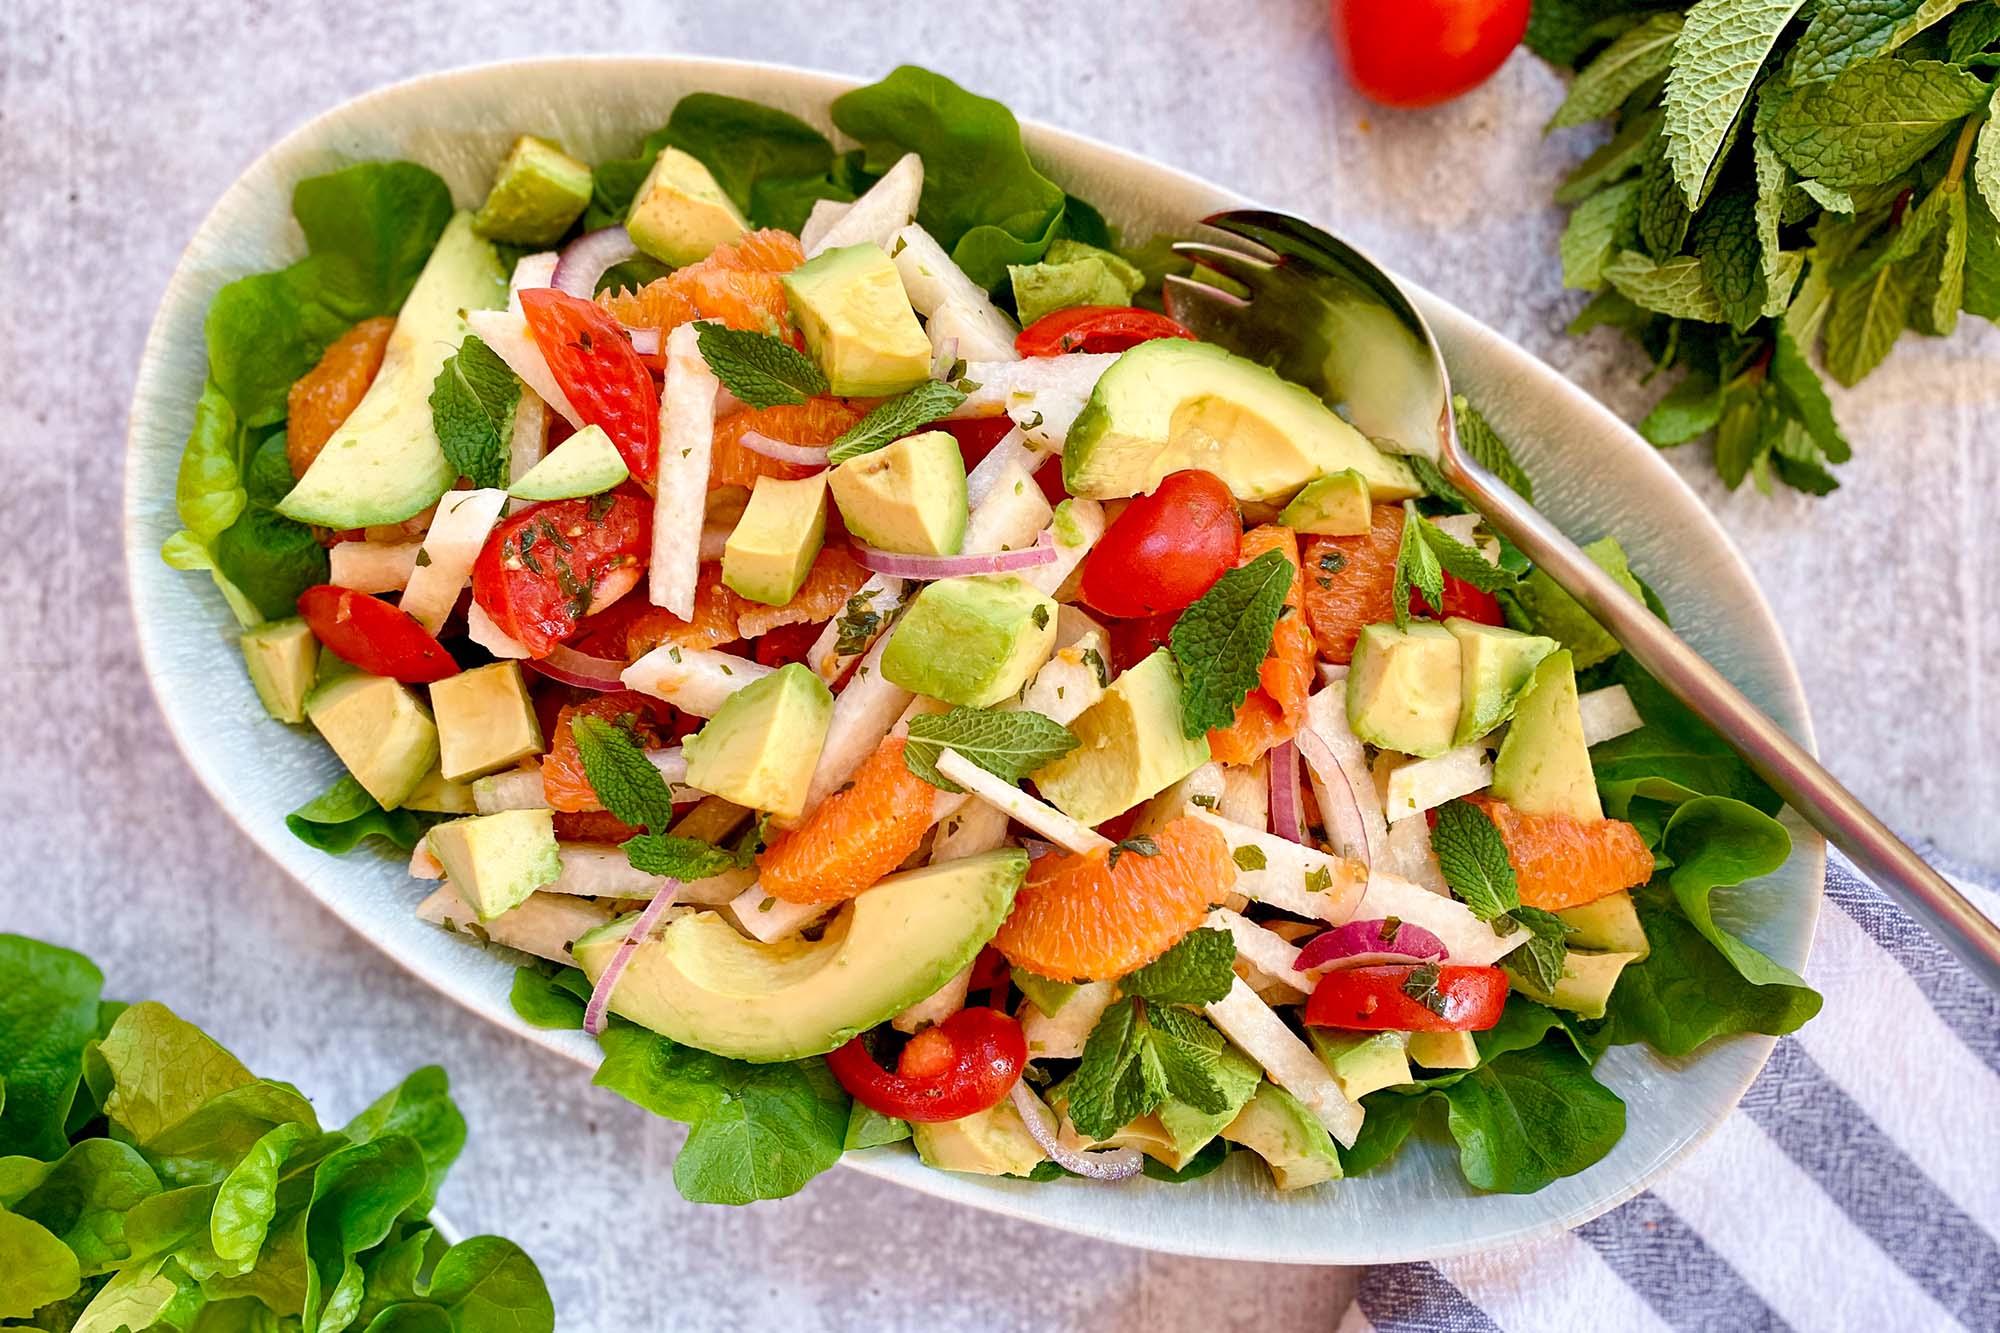 Jicama, Avocado, and Orange Salad Recipe